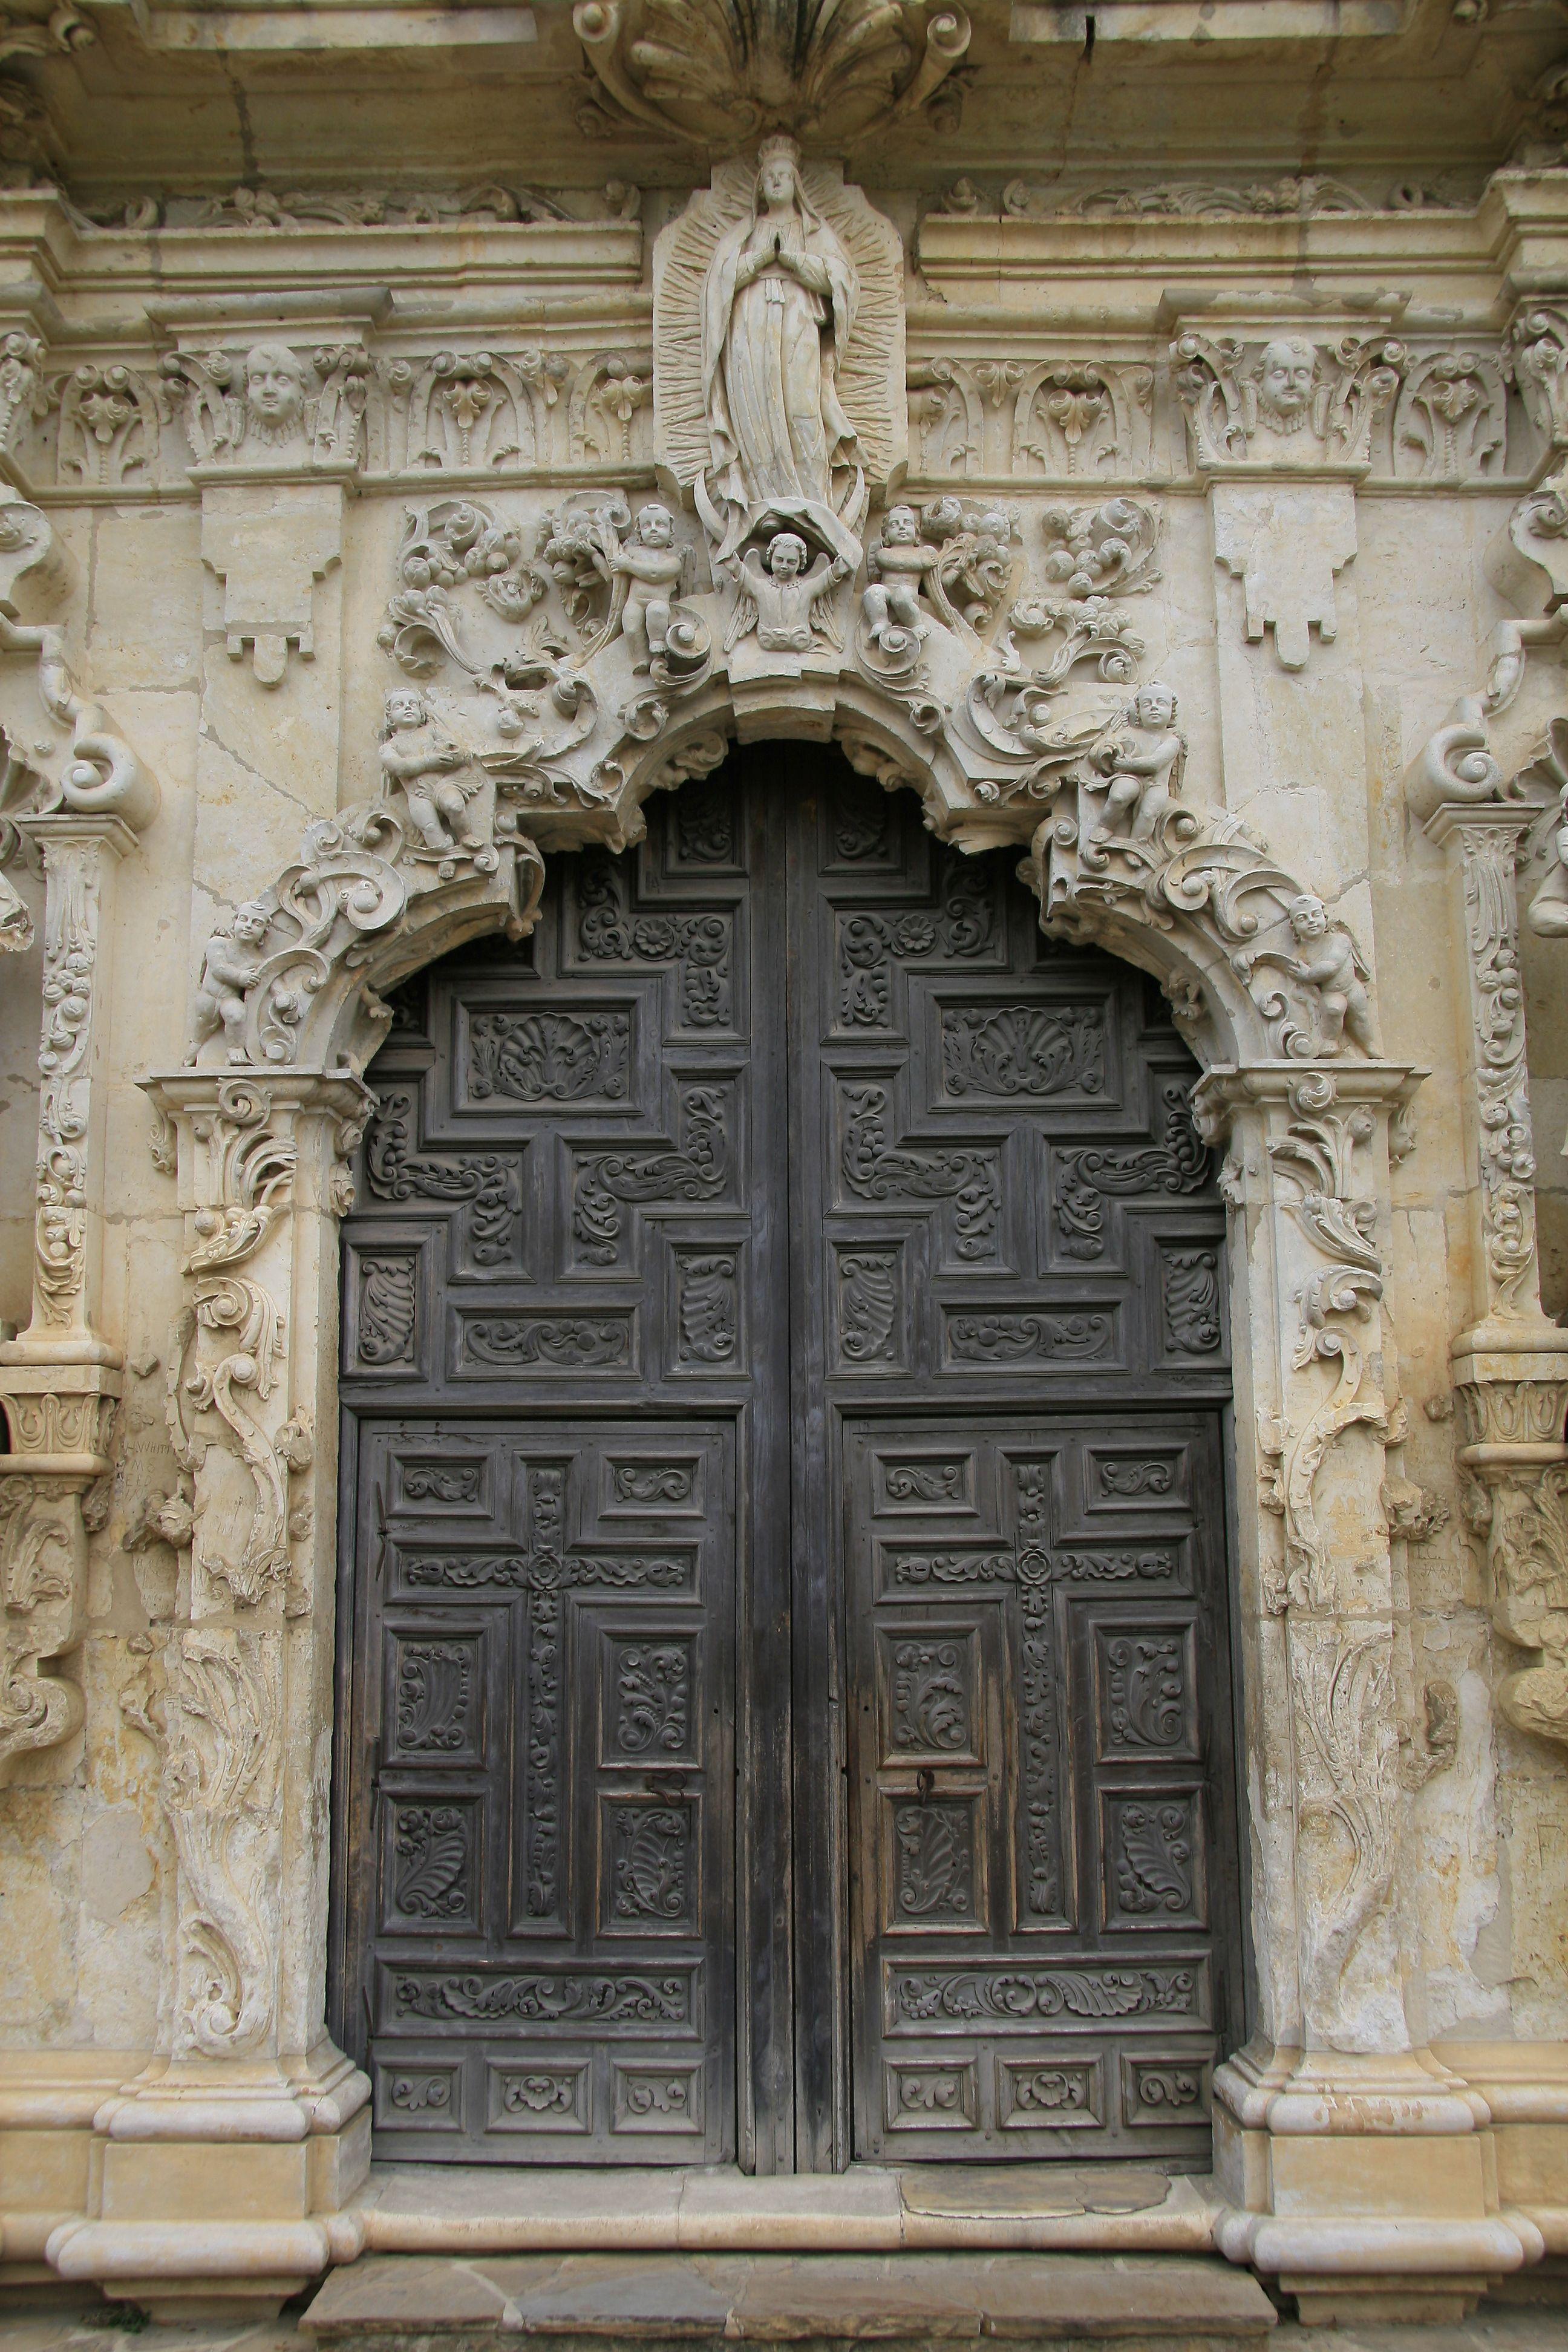 Mission San José Y Miguel De Aguayo Antonio Missions National Historical Park Texas Elaborately Carved Portal At The Front Facade